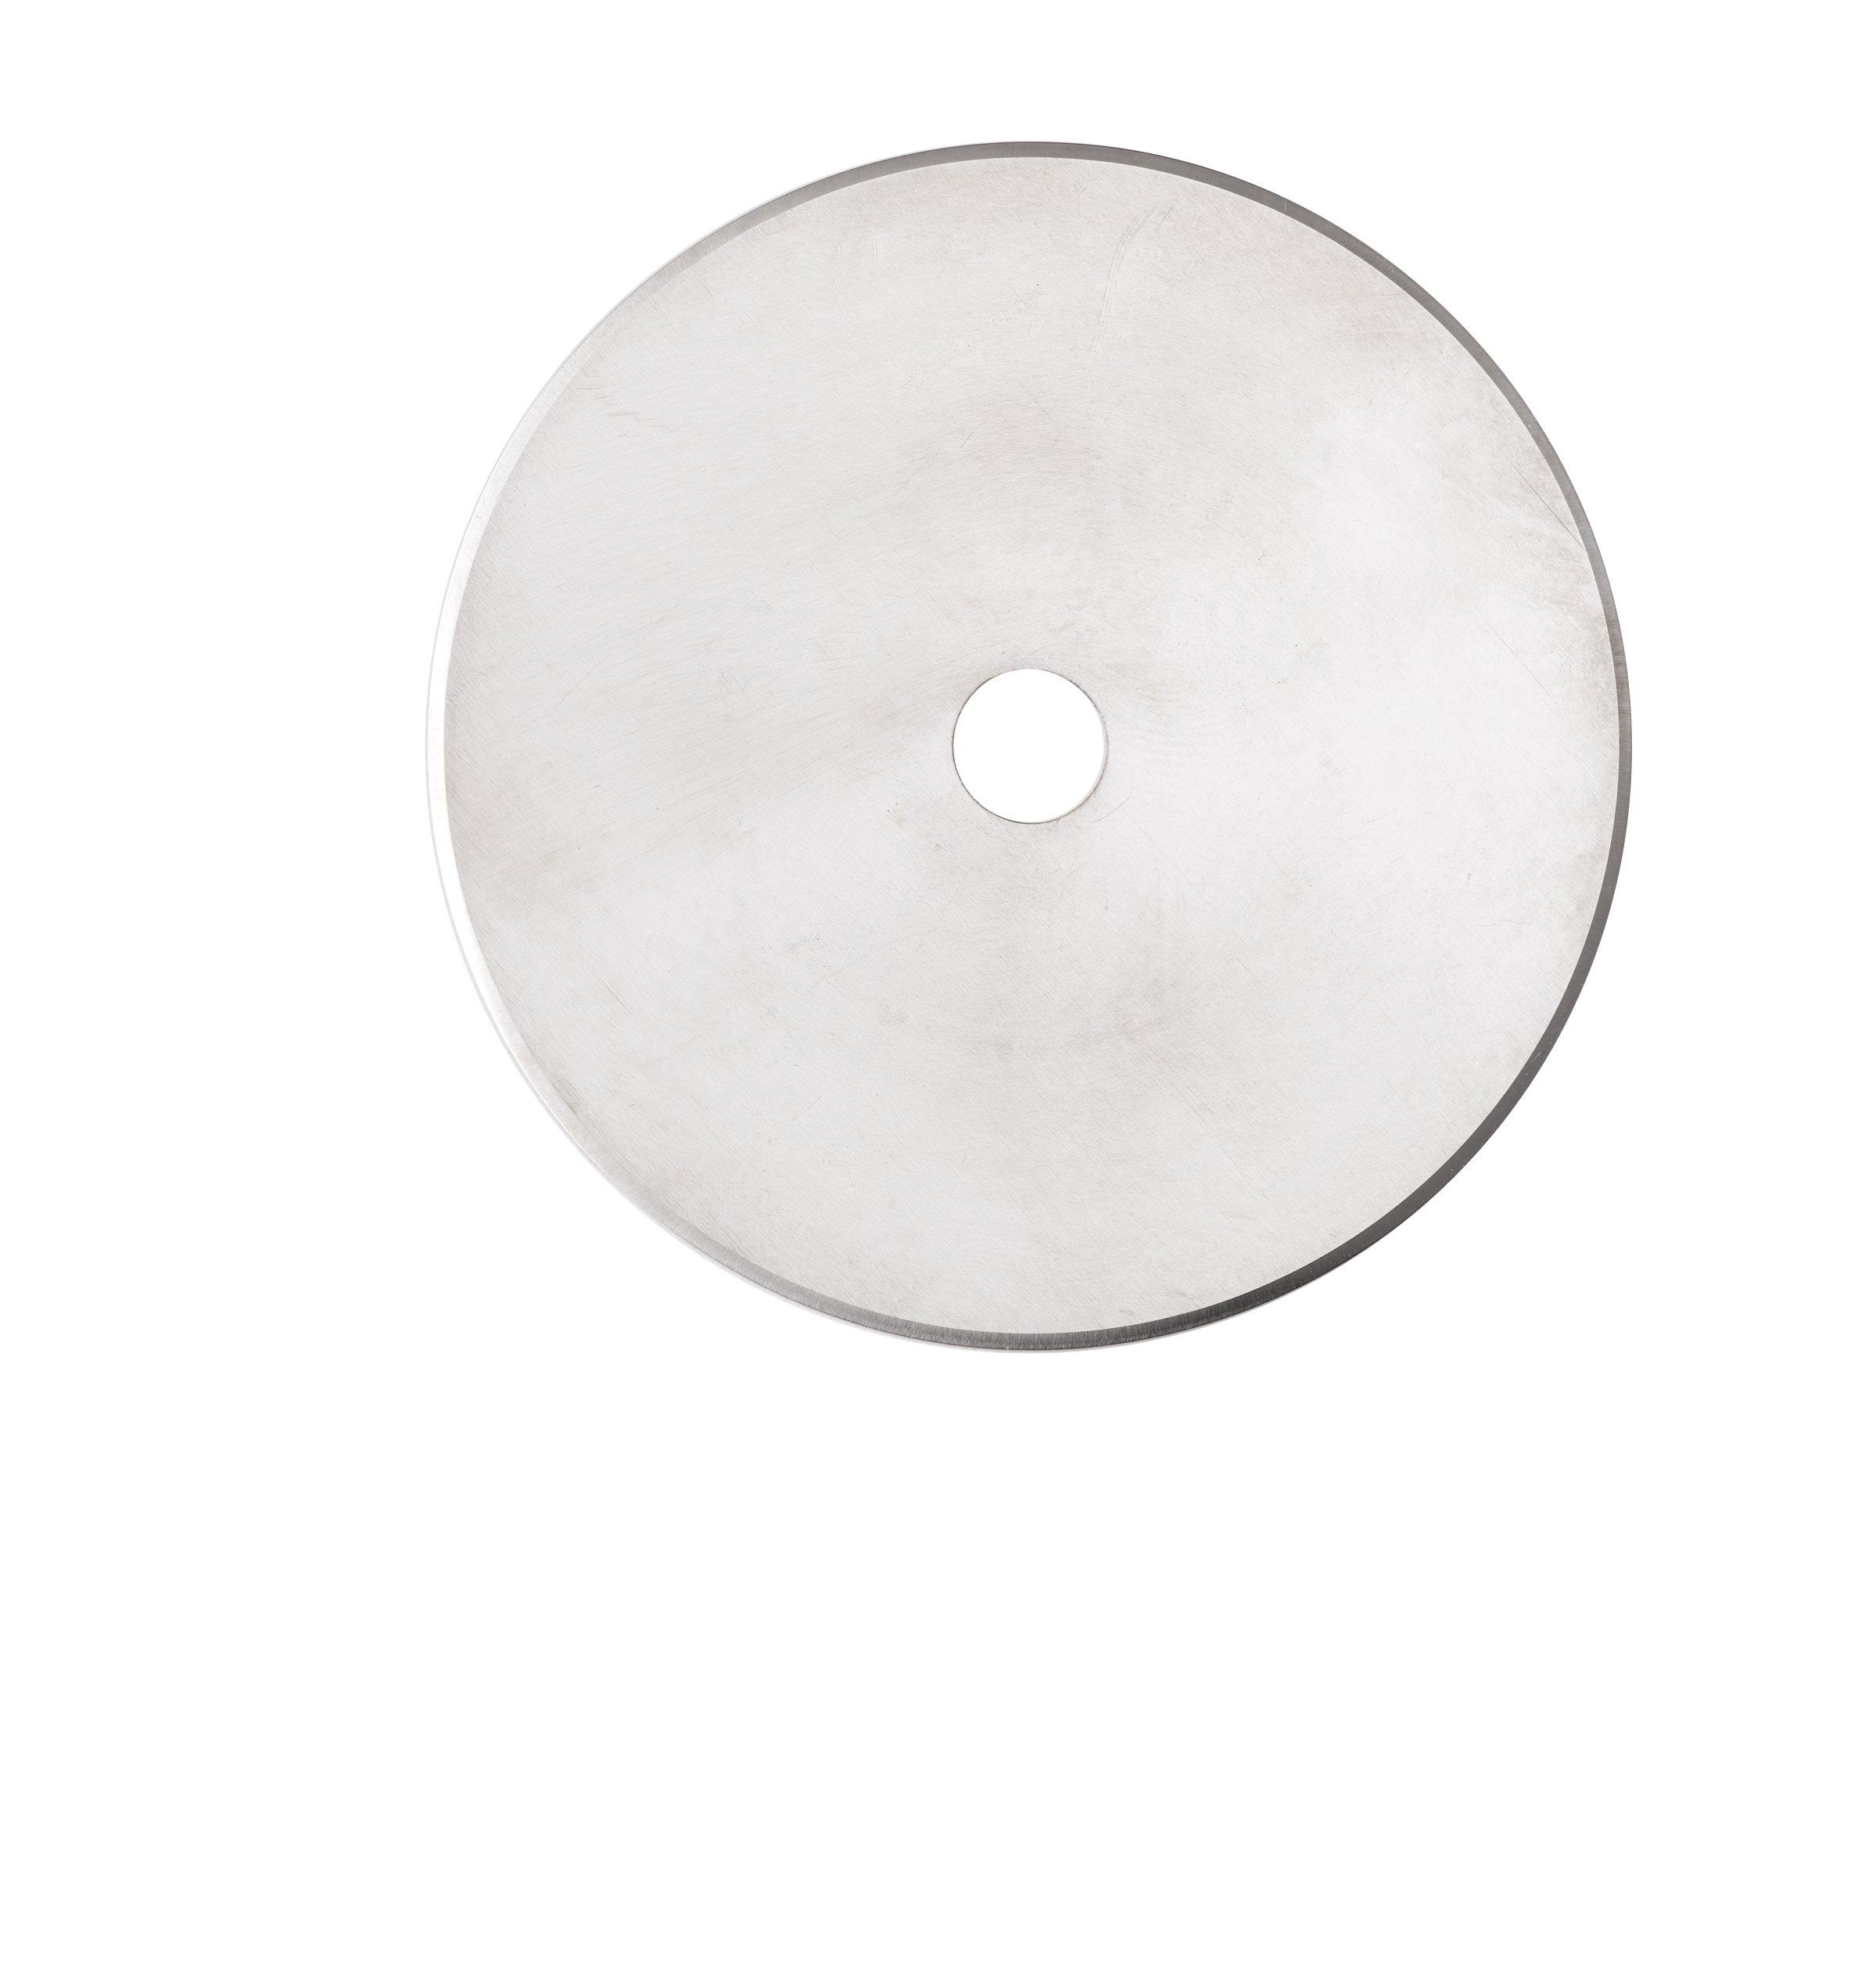 2 Cuchillas de repuesto de titanio Fiskars 45mm